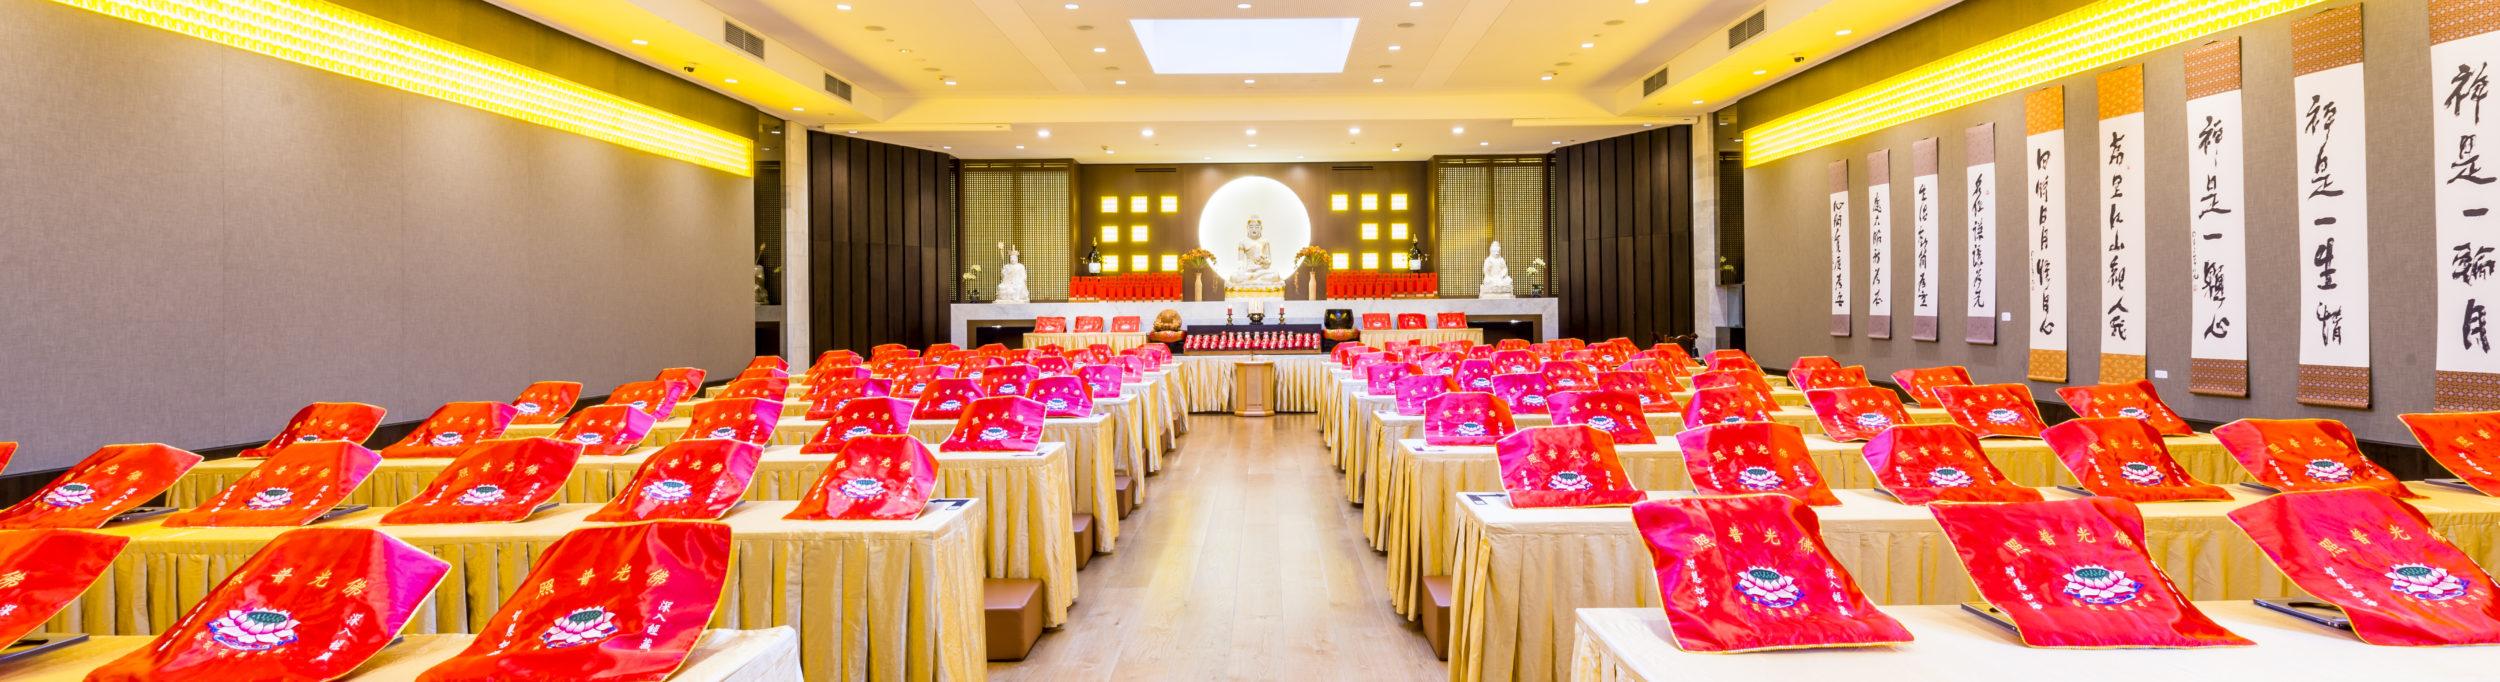 Fo Guang Shan Er You Temple